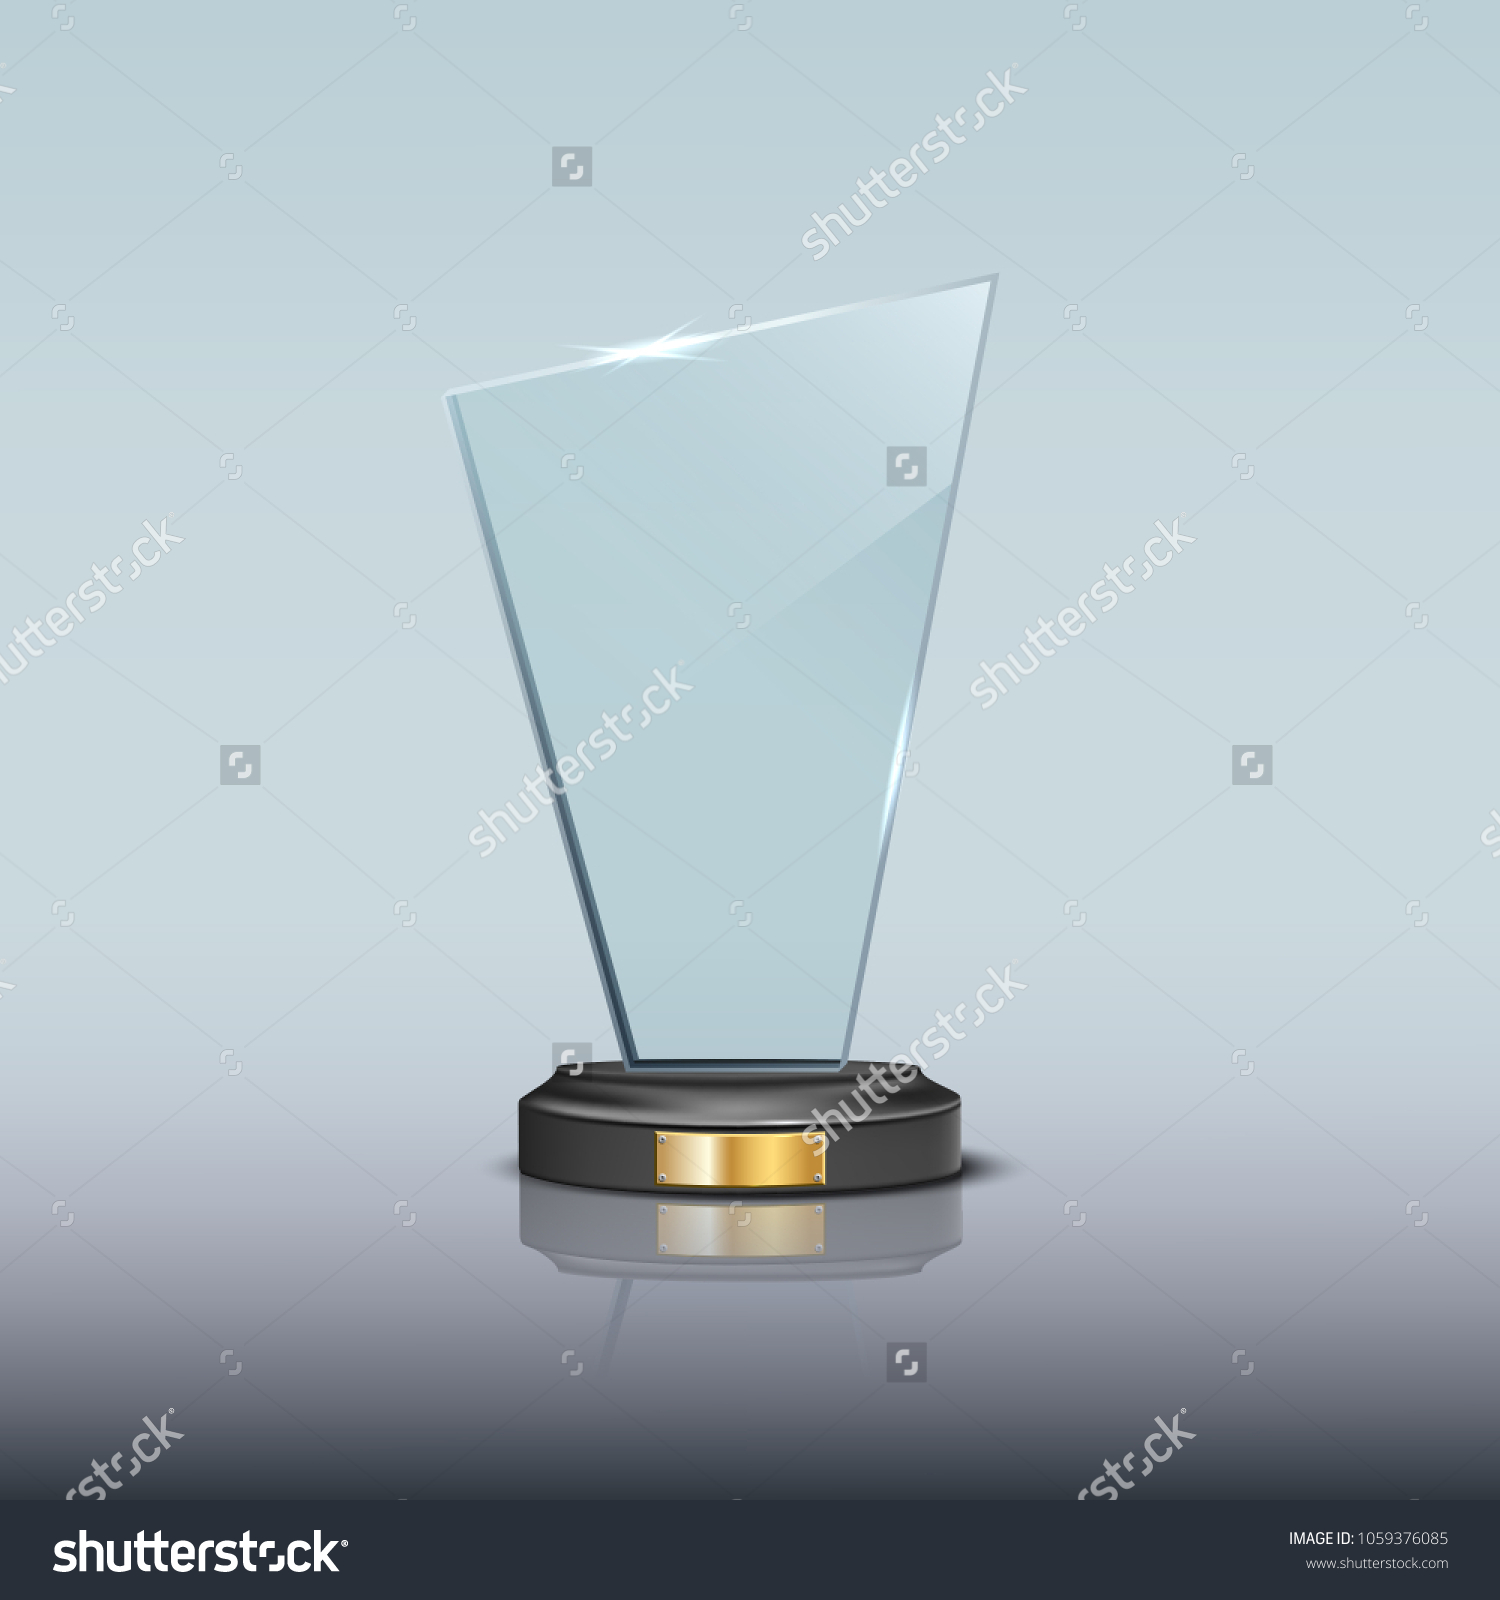 Blank Award Template from image.shutterstock.com